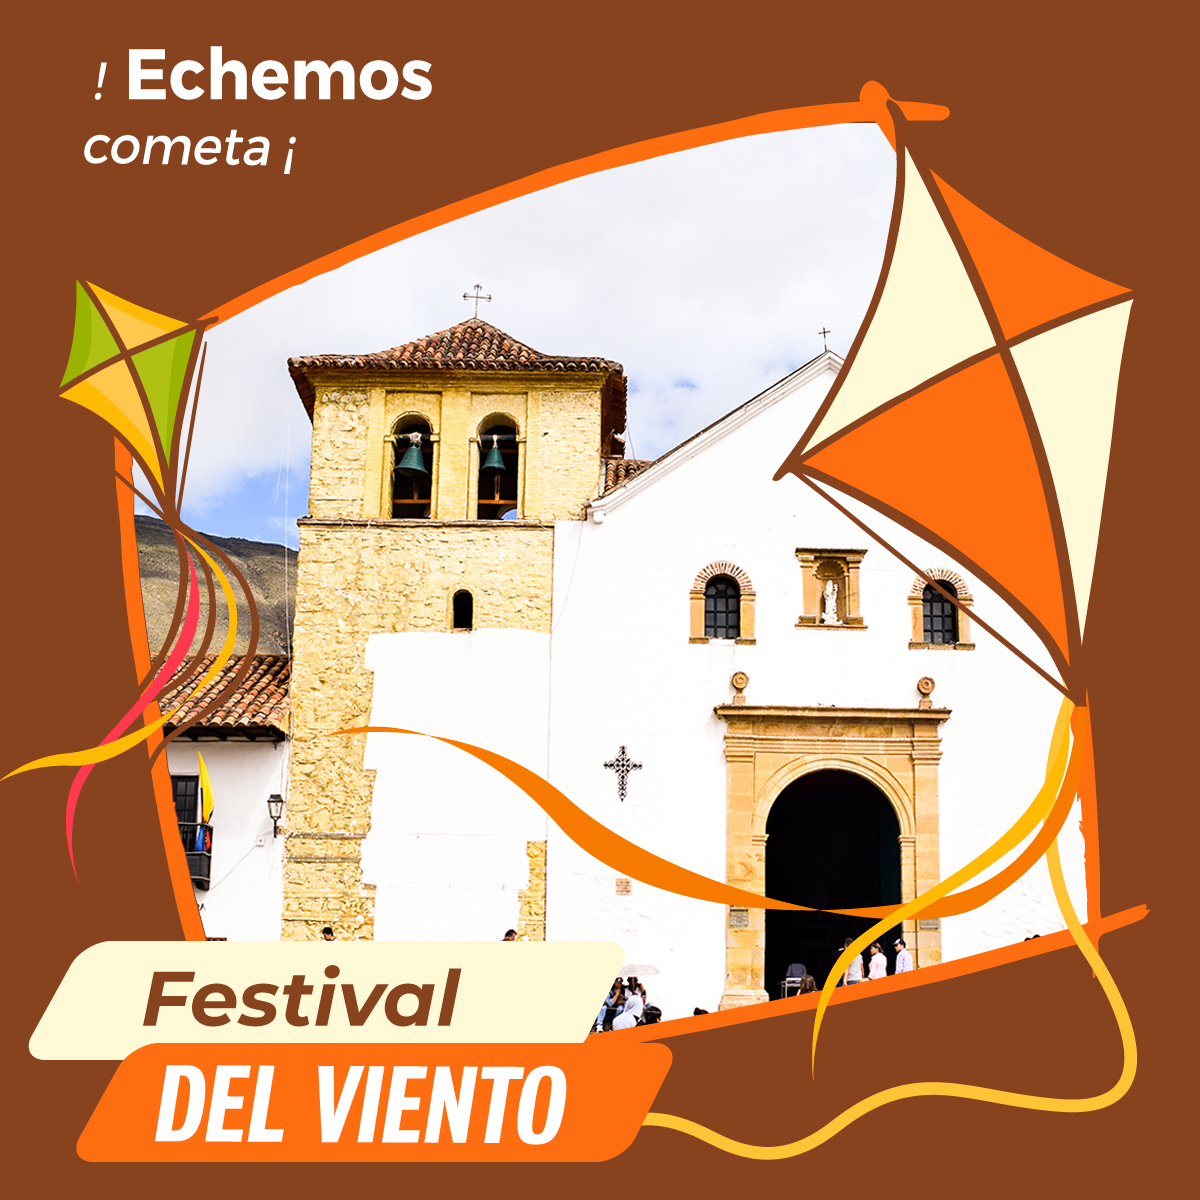 Tema: Festivales